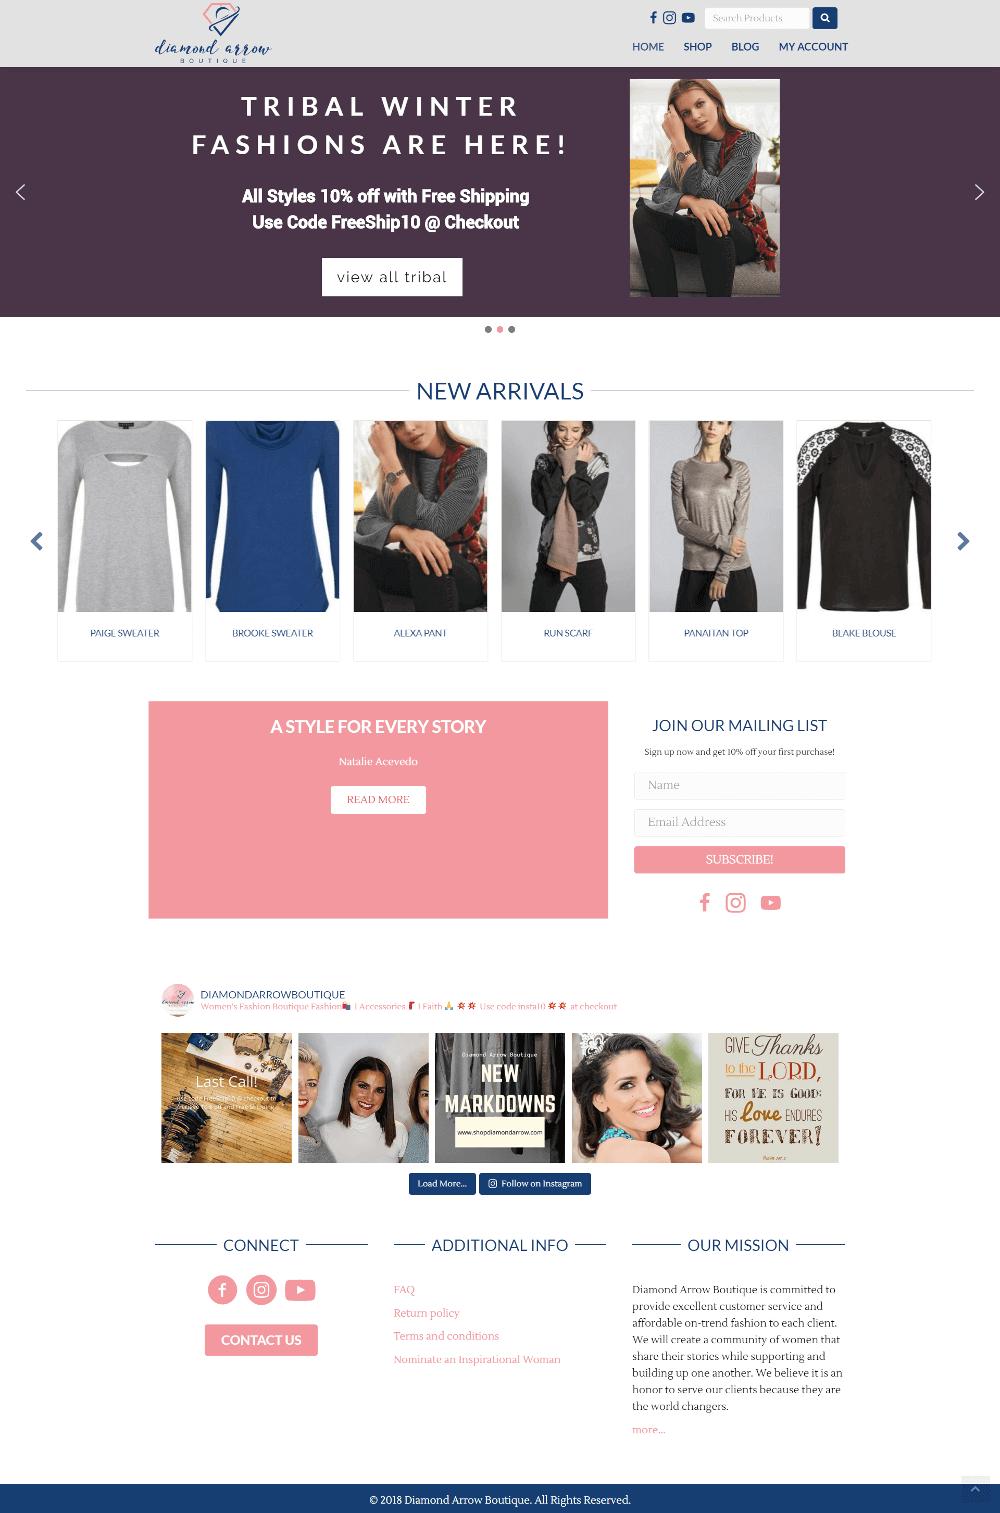 Screenshot of Diamond Arrow Boutique's homepage